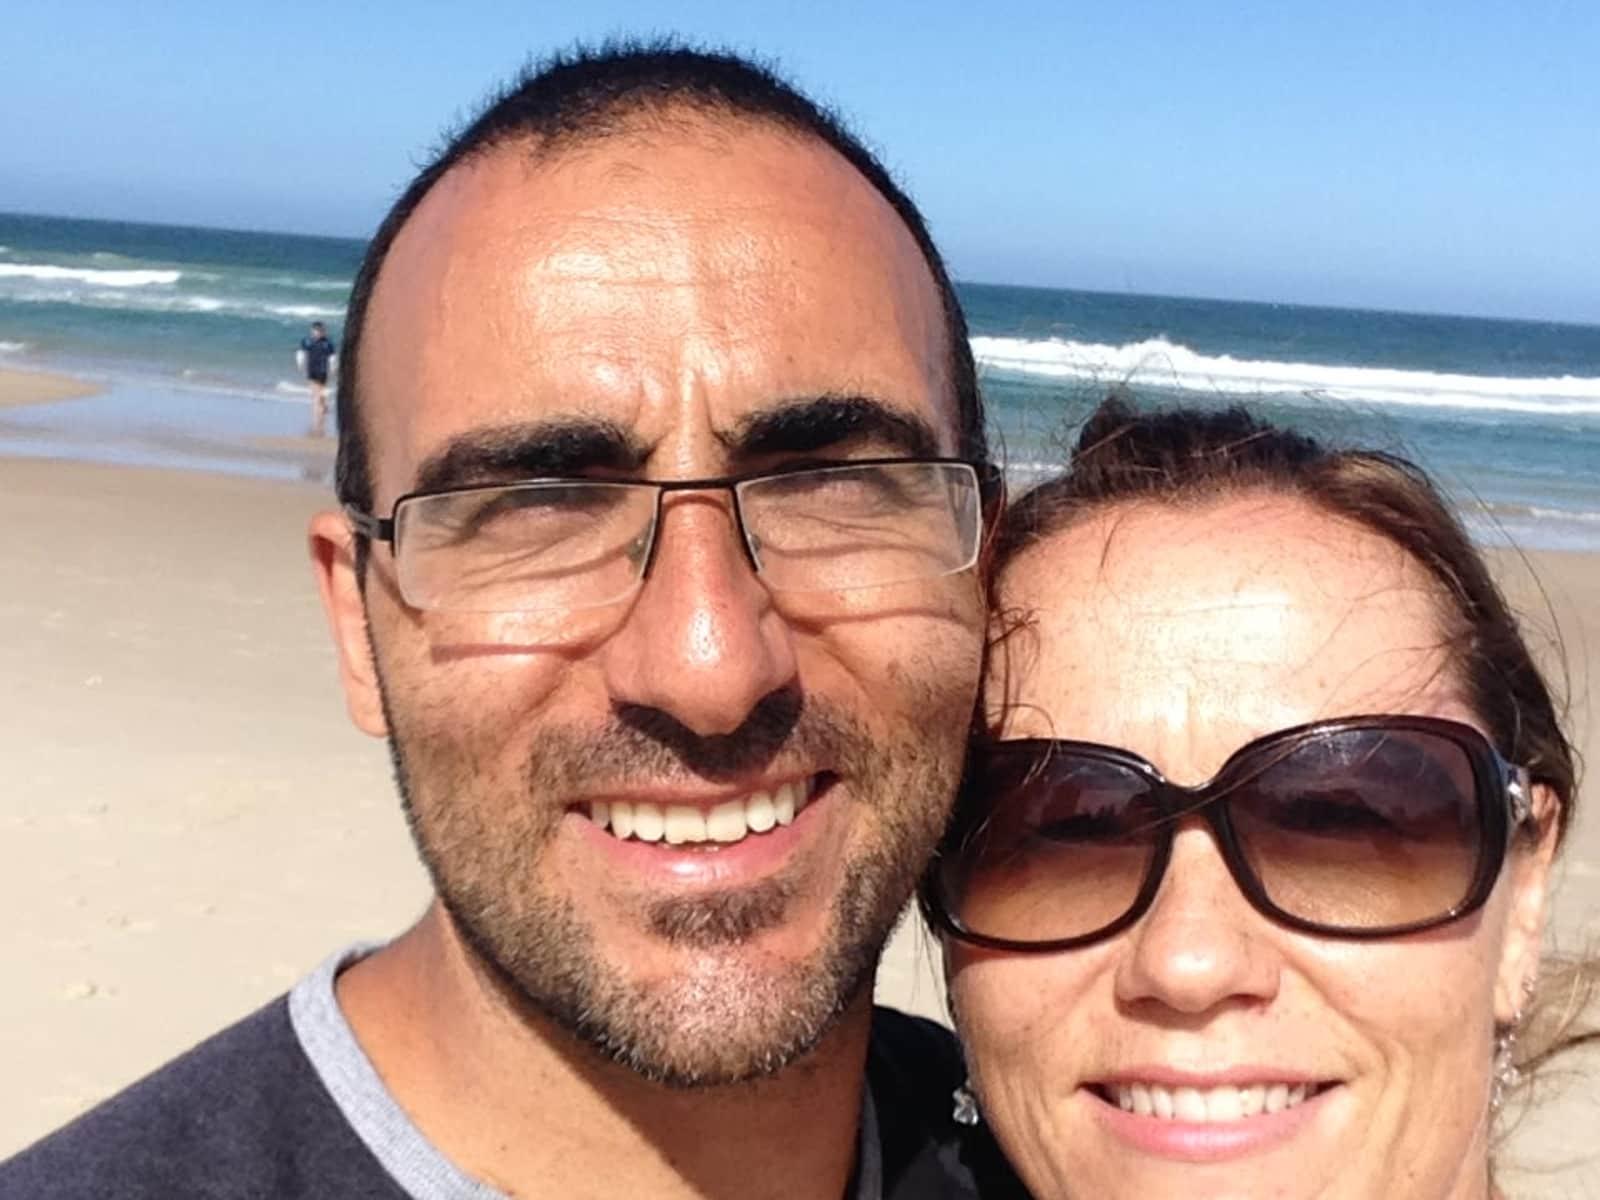 Sharon & Domenic from Albury, New South Wales, Australia